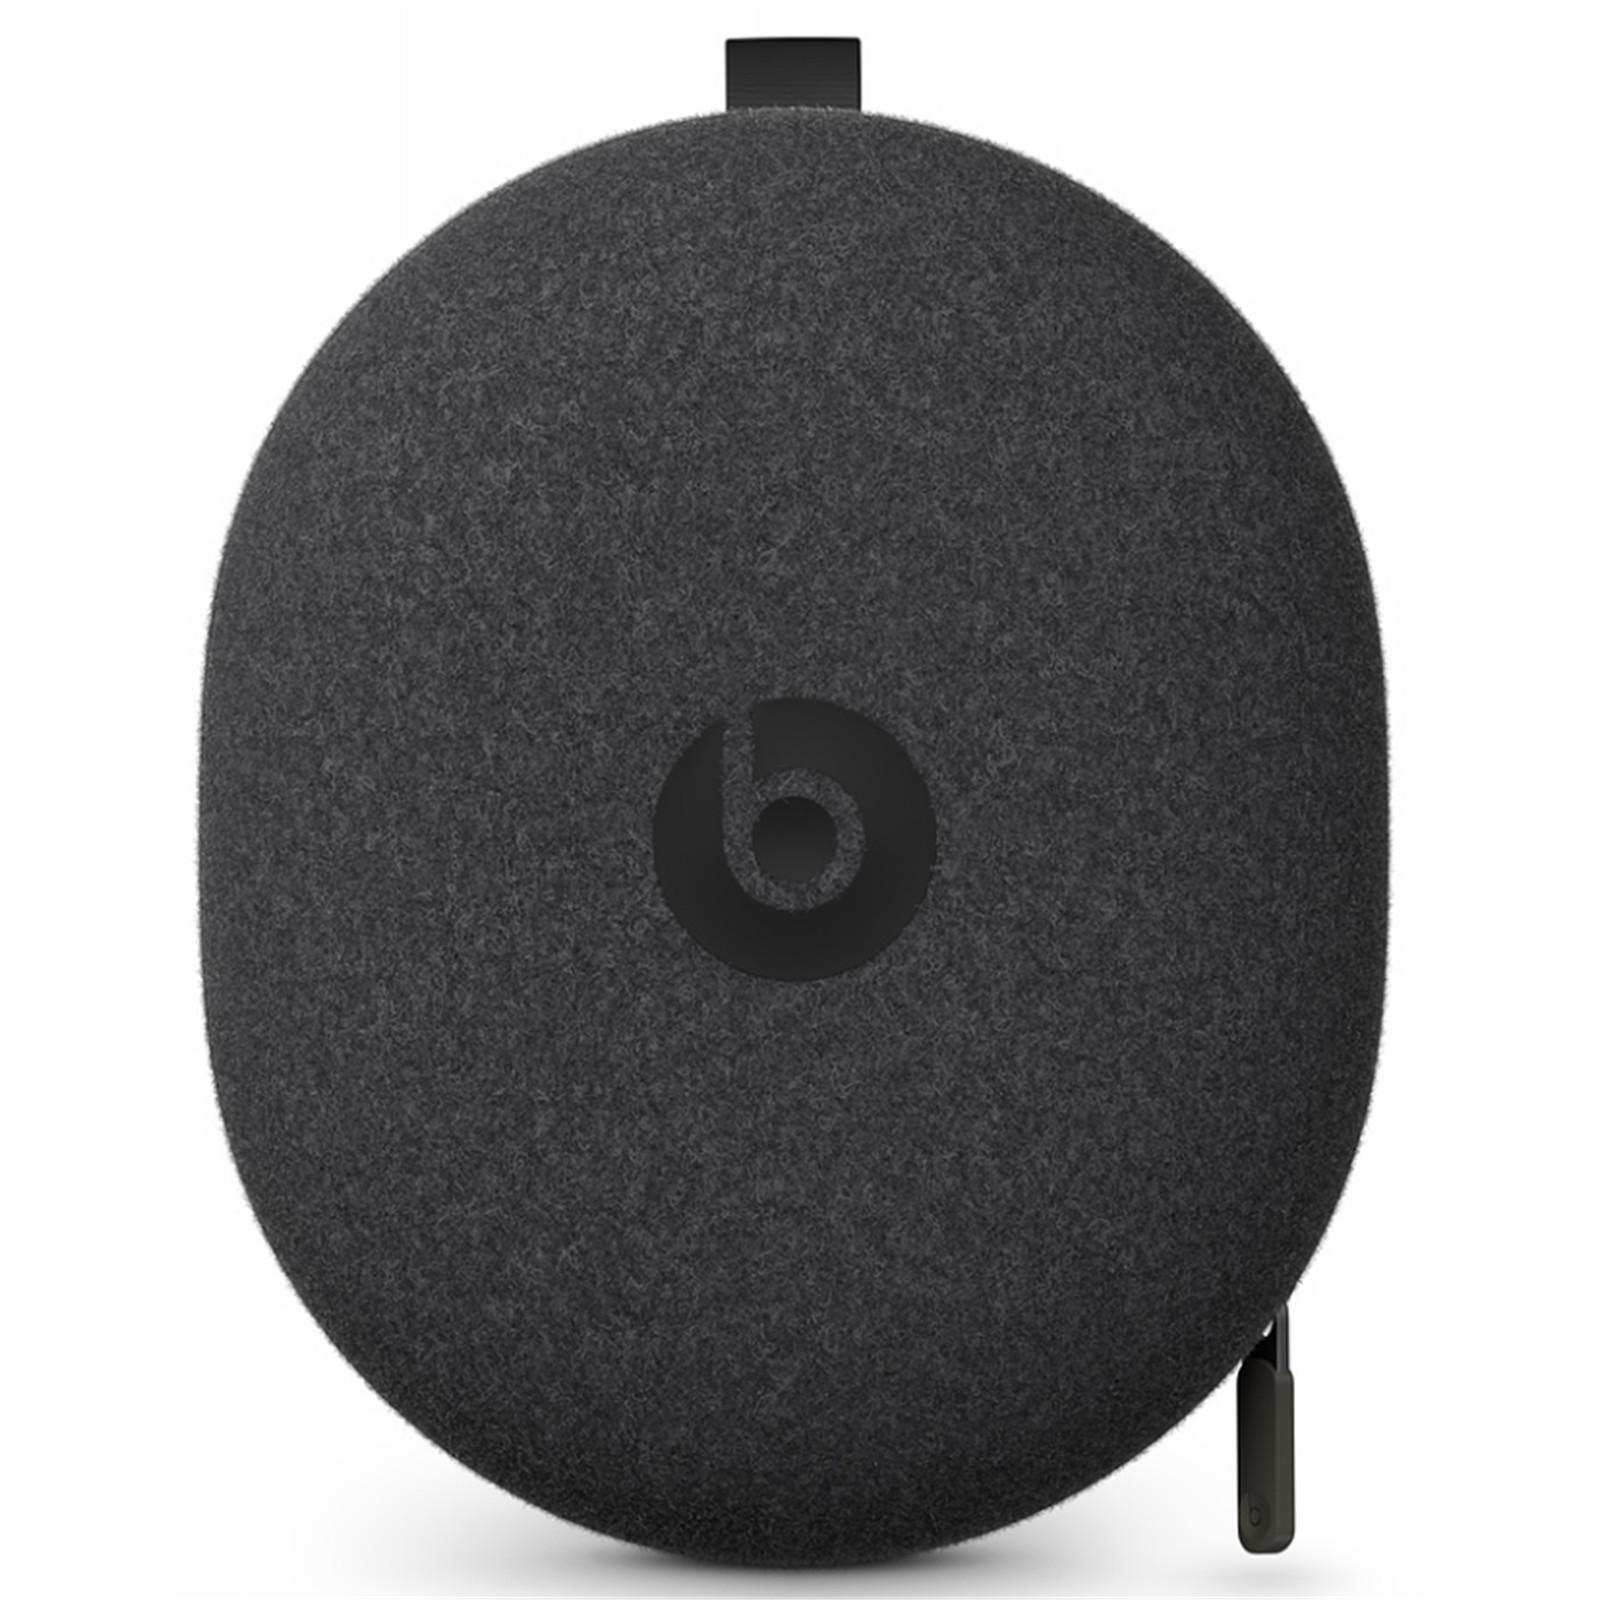 Buy The Beats Solo Pro Wireless Noise Cancelling Headphones More Matte Mrjc2fe A Online Pbtech Co Nz